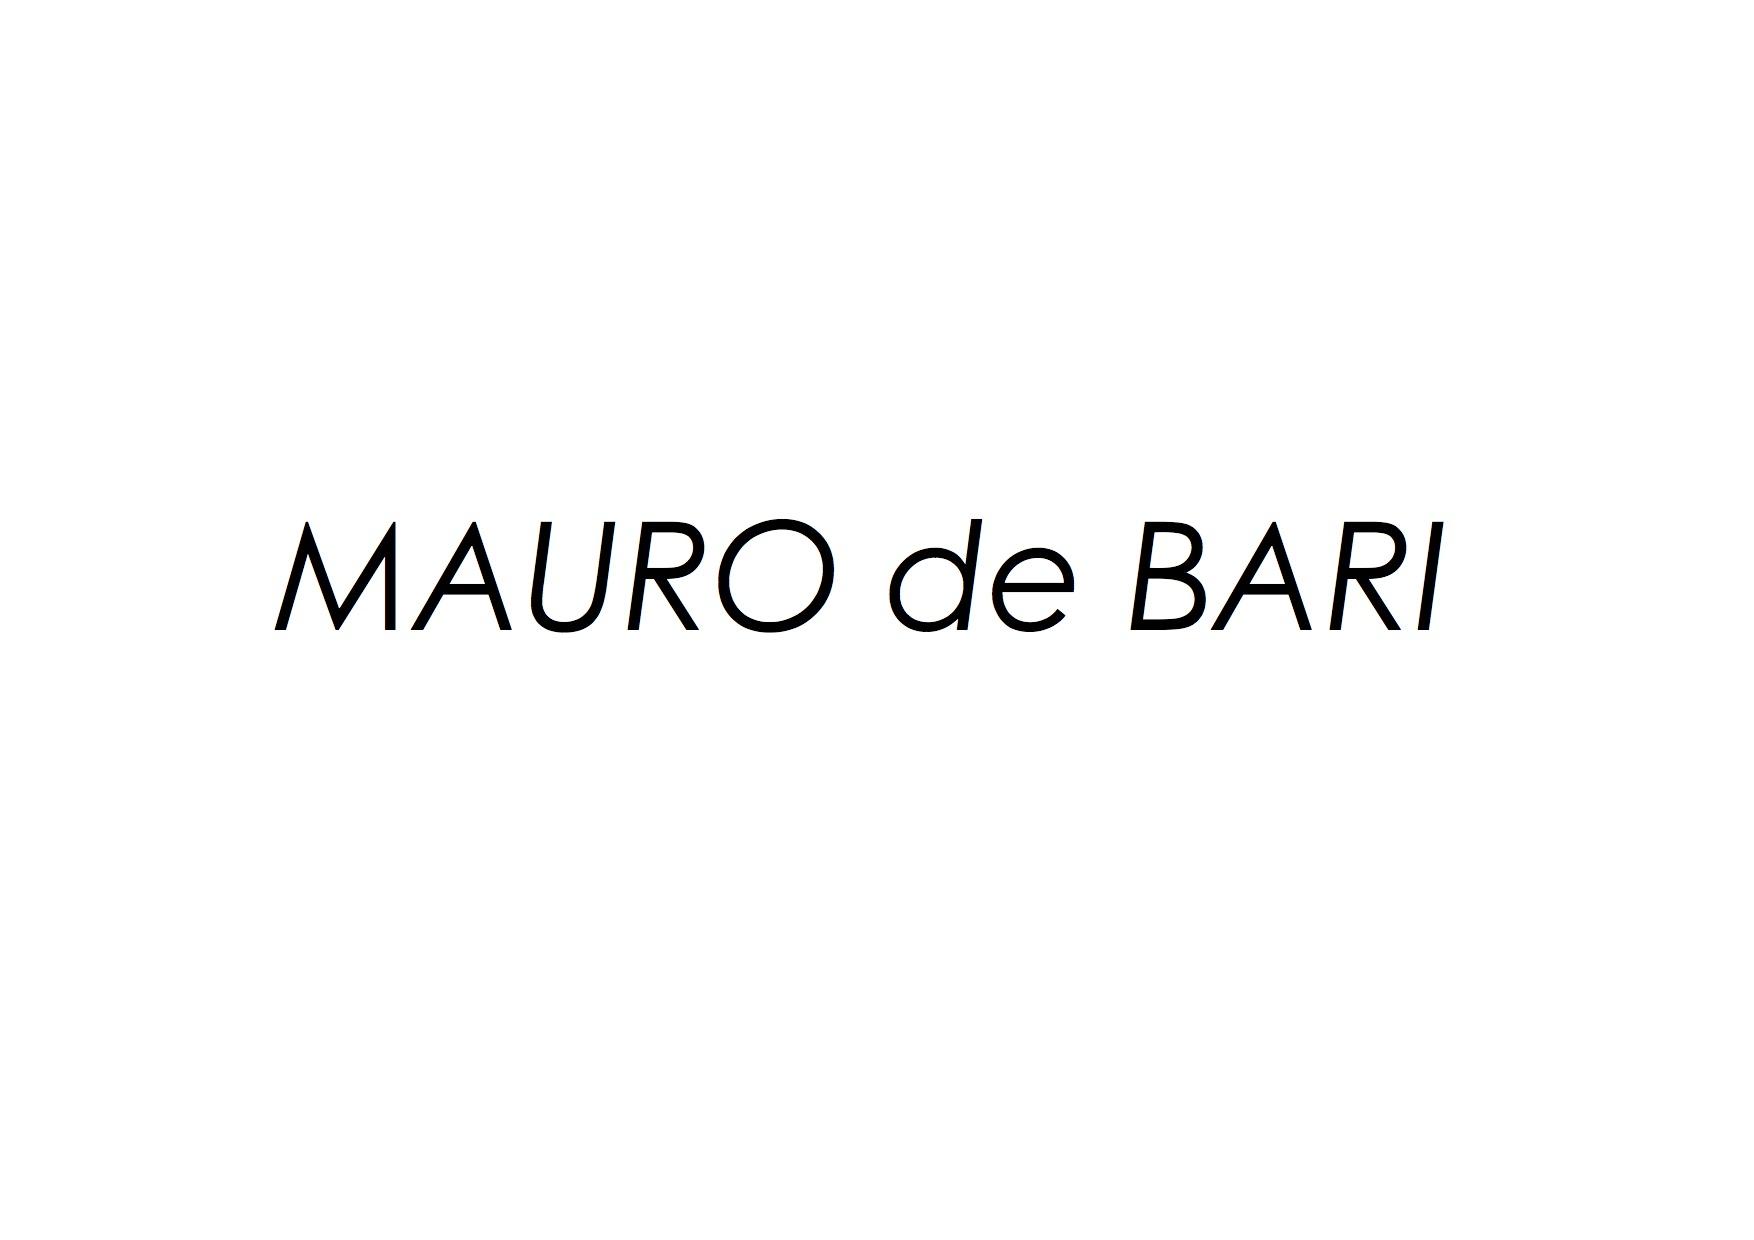 MAURO de BARI